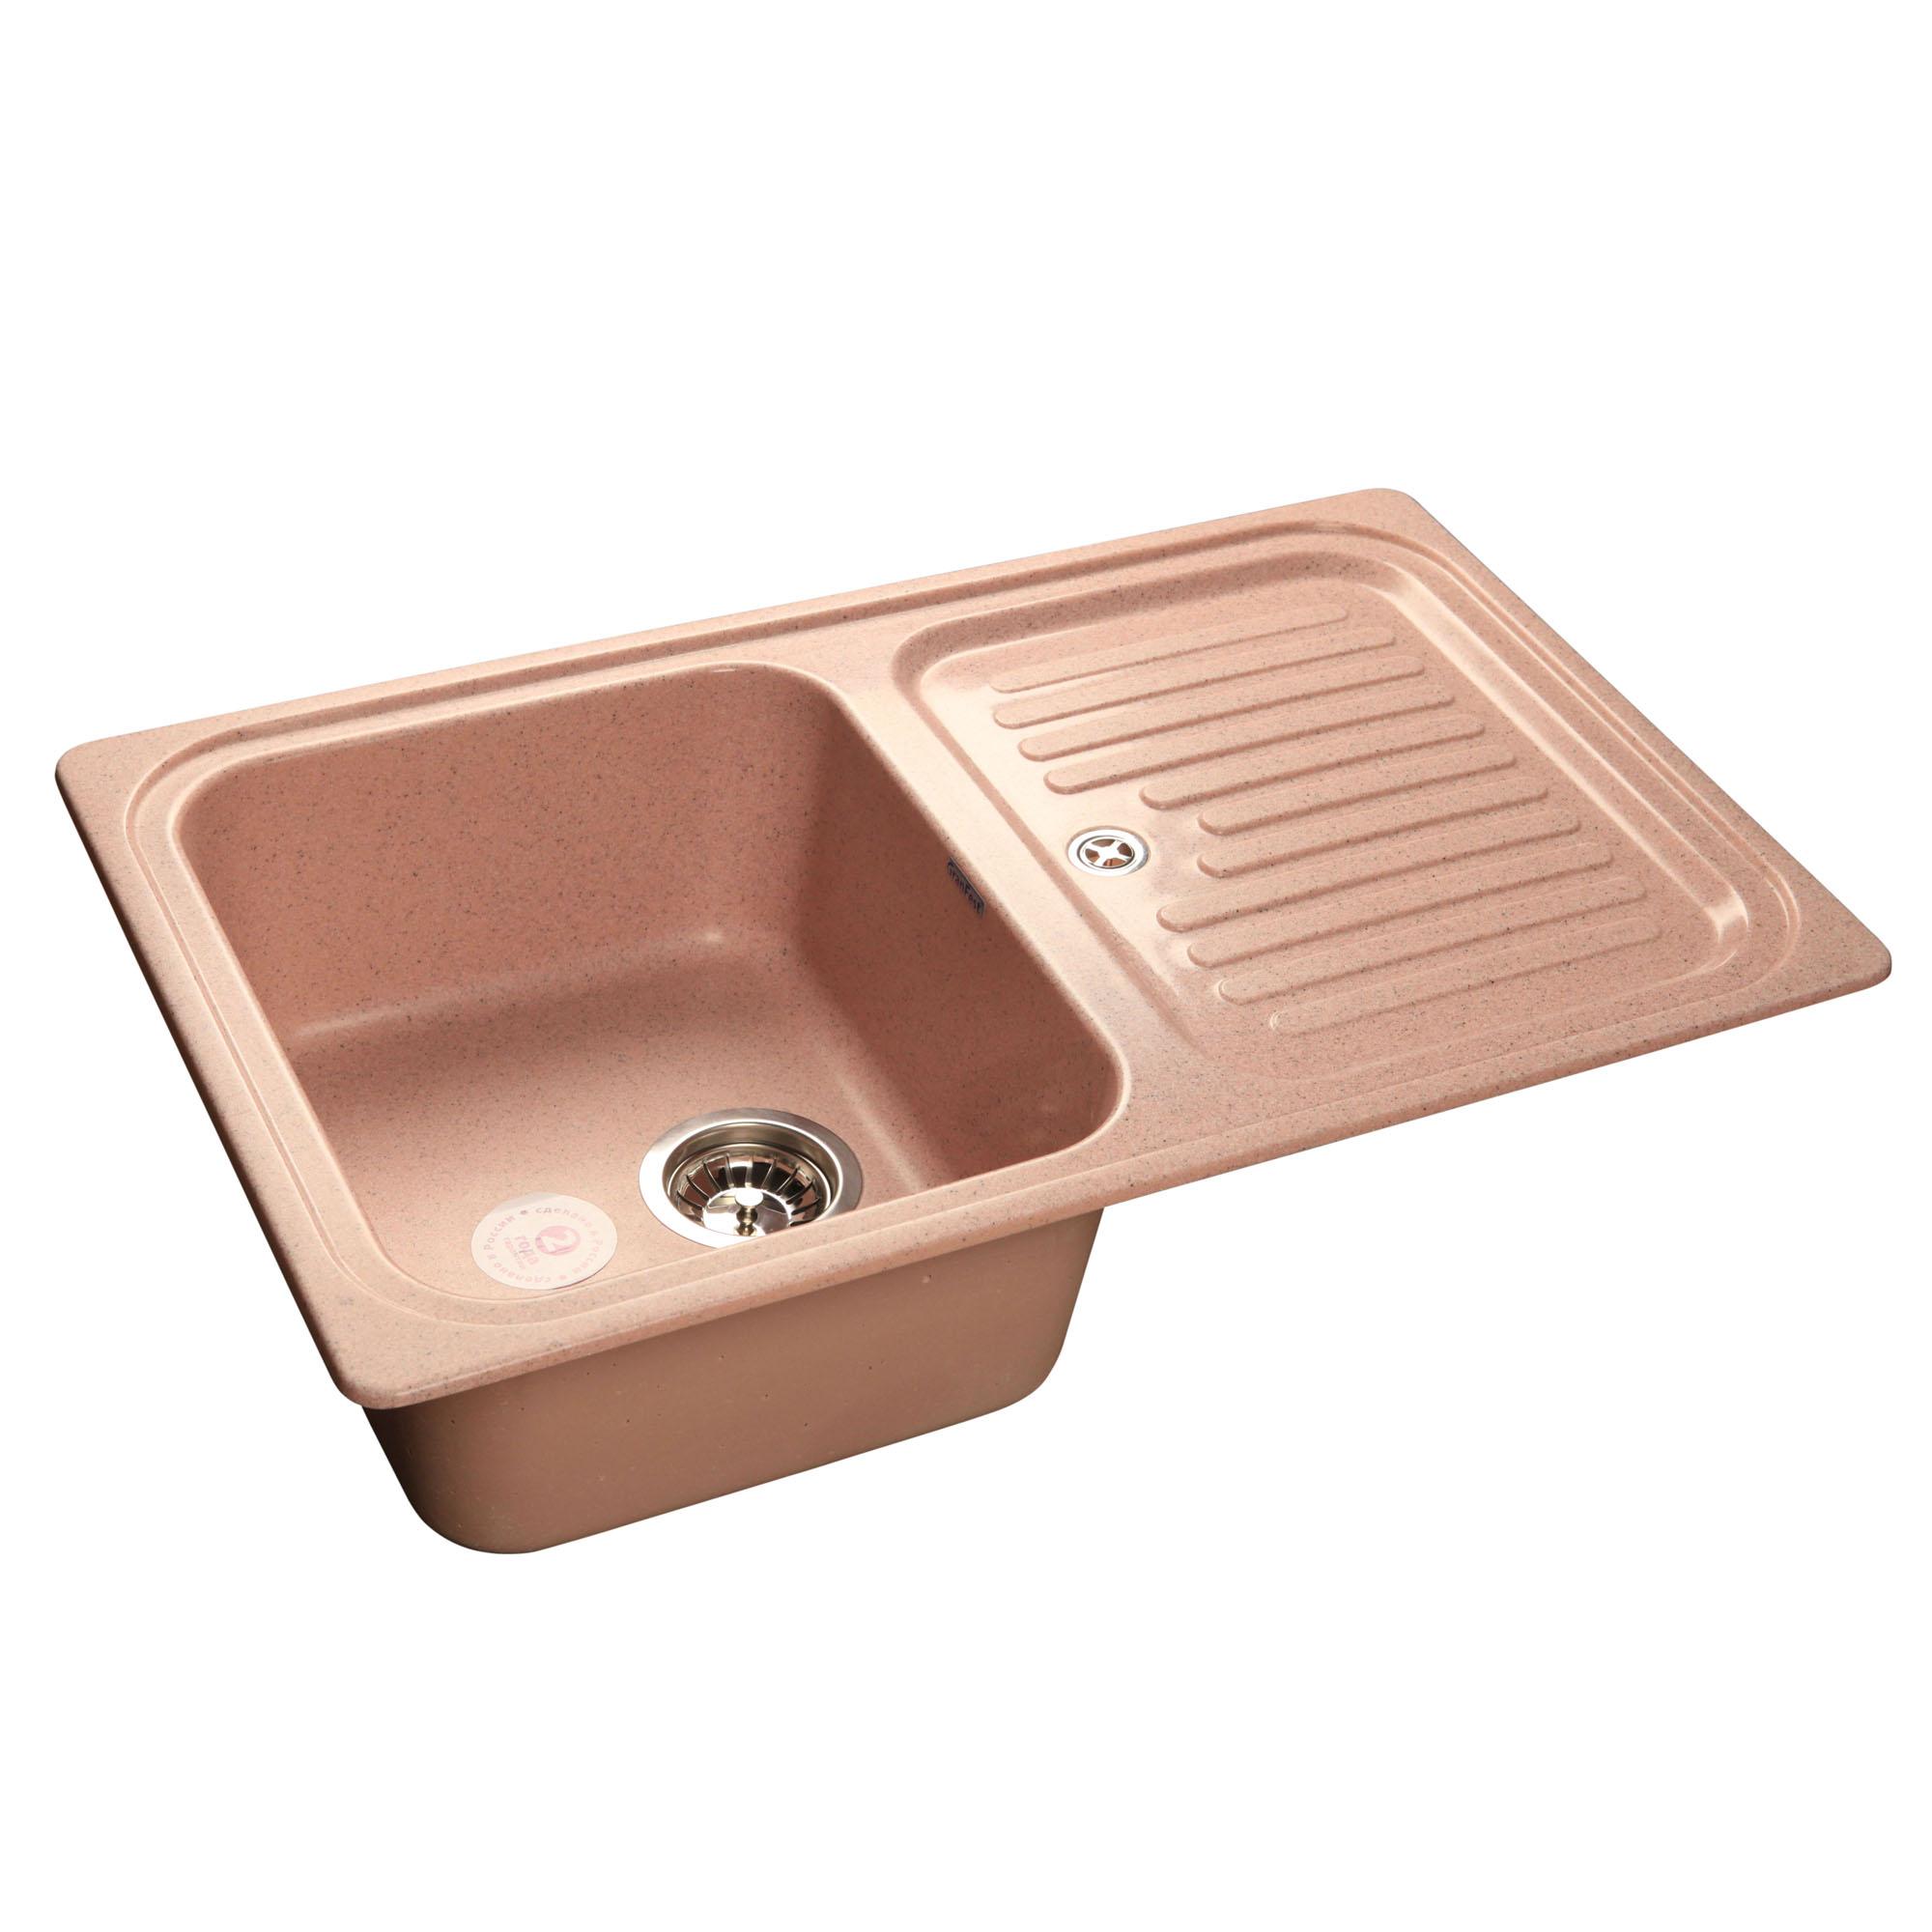 Кухонная мойка GranFest Standart GF-S780L розовый мойка кухонная granfest gf s780l песок чаша крыло